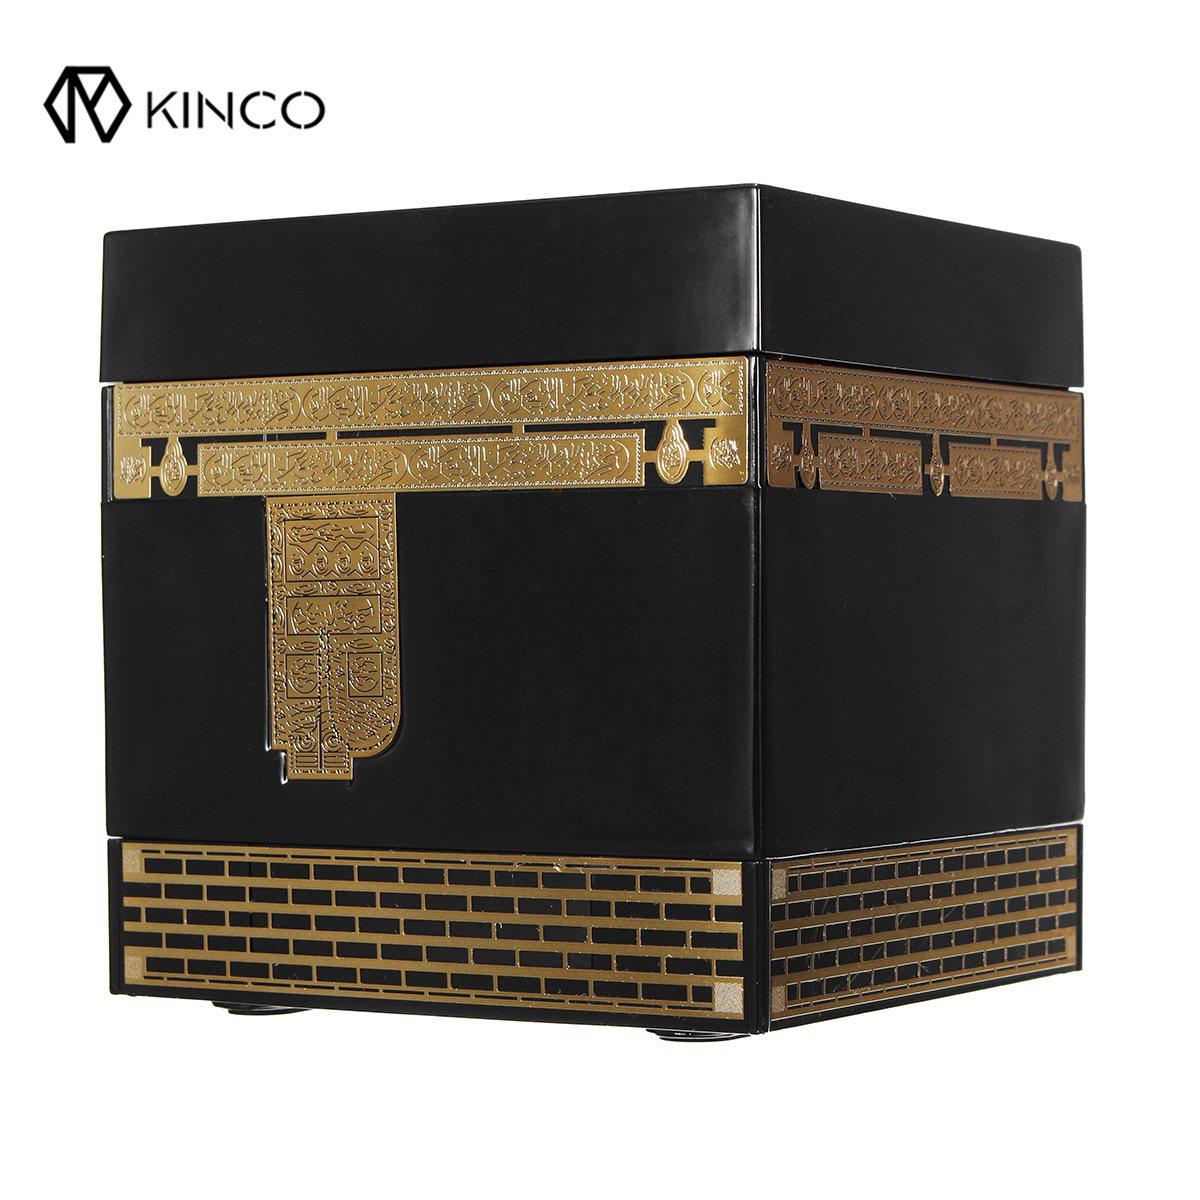 KINCO Wireless Remote Control Quran Bluetooth Speaker Portable MP3 FM Radio Speaker with 24 Languages проигрыватель для корана quran enmac pq15